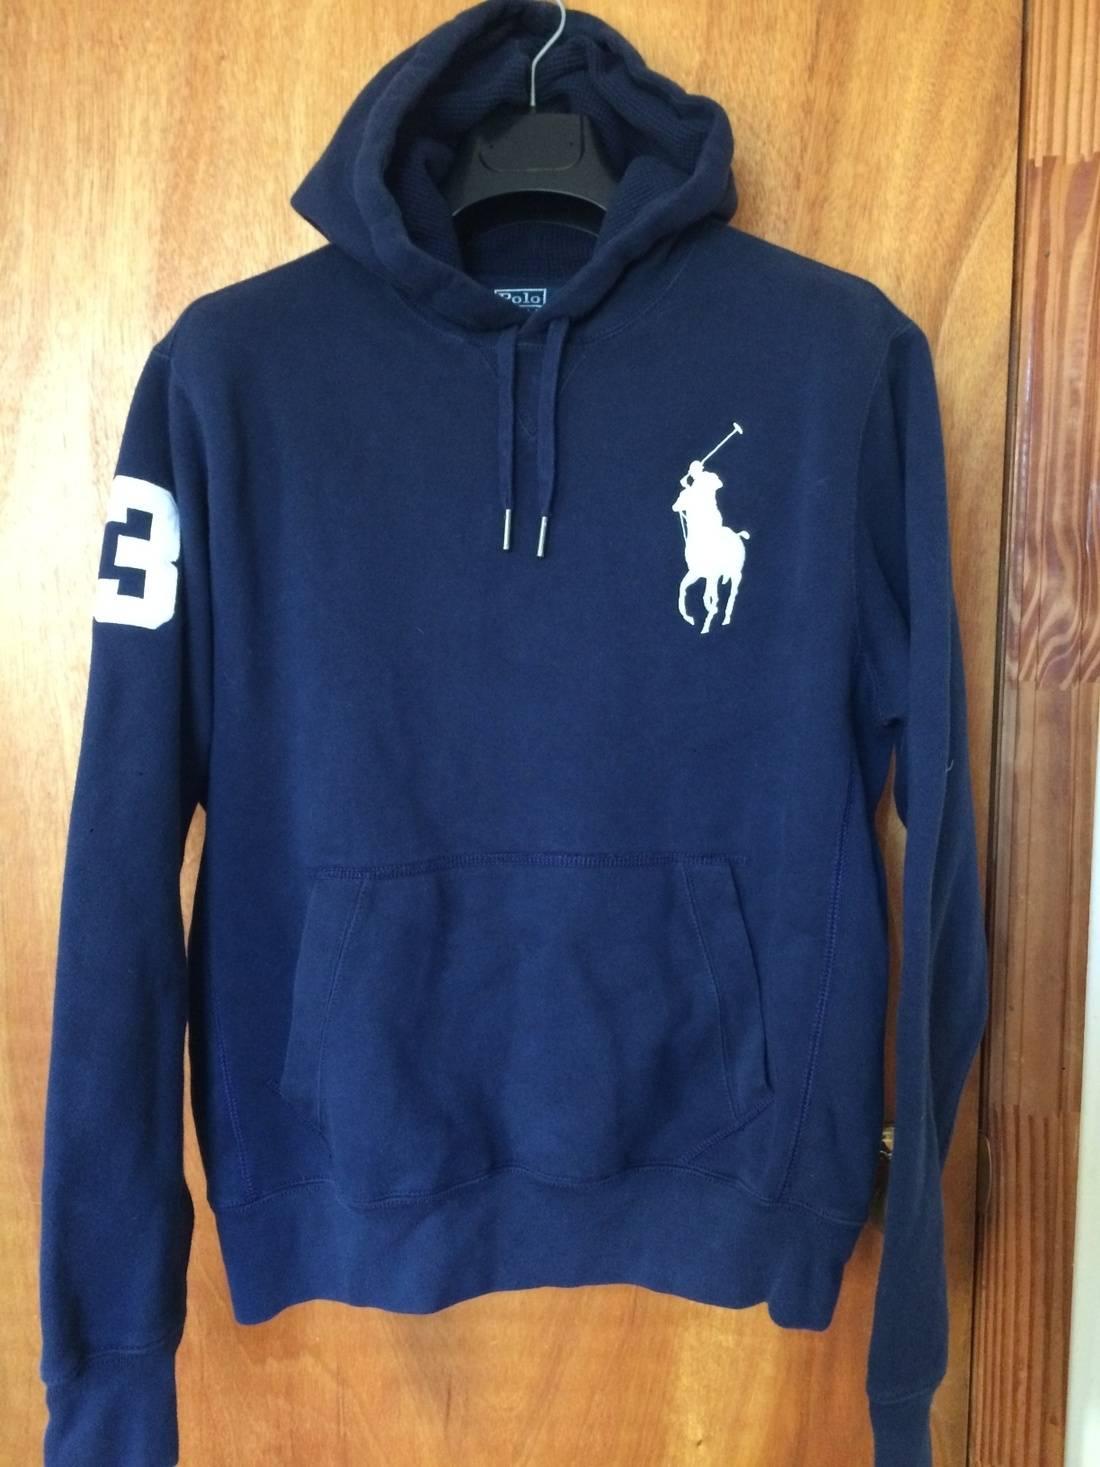 Rare polo Ralph Lauren small pony jacket full zipper L size 6JTh2S